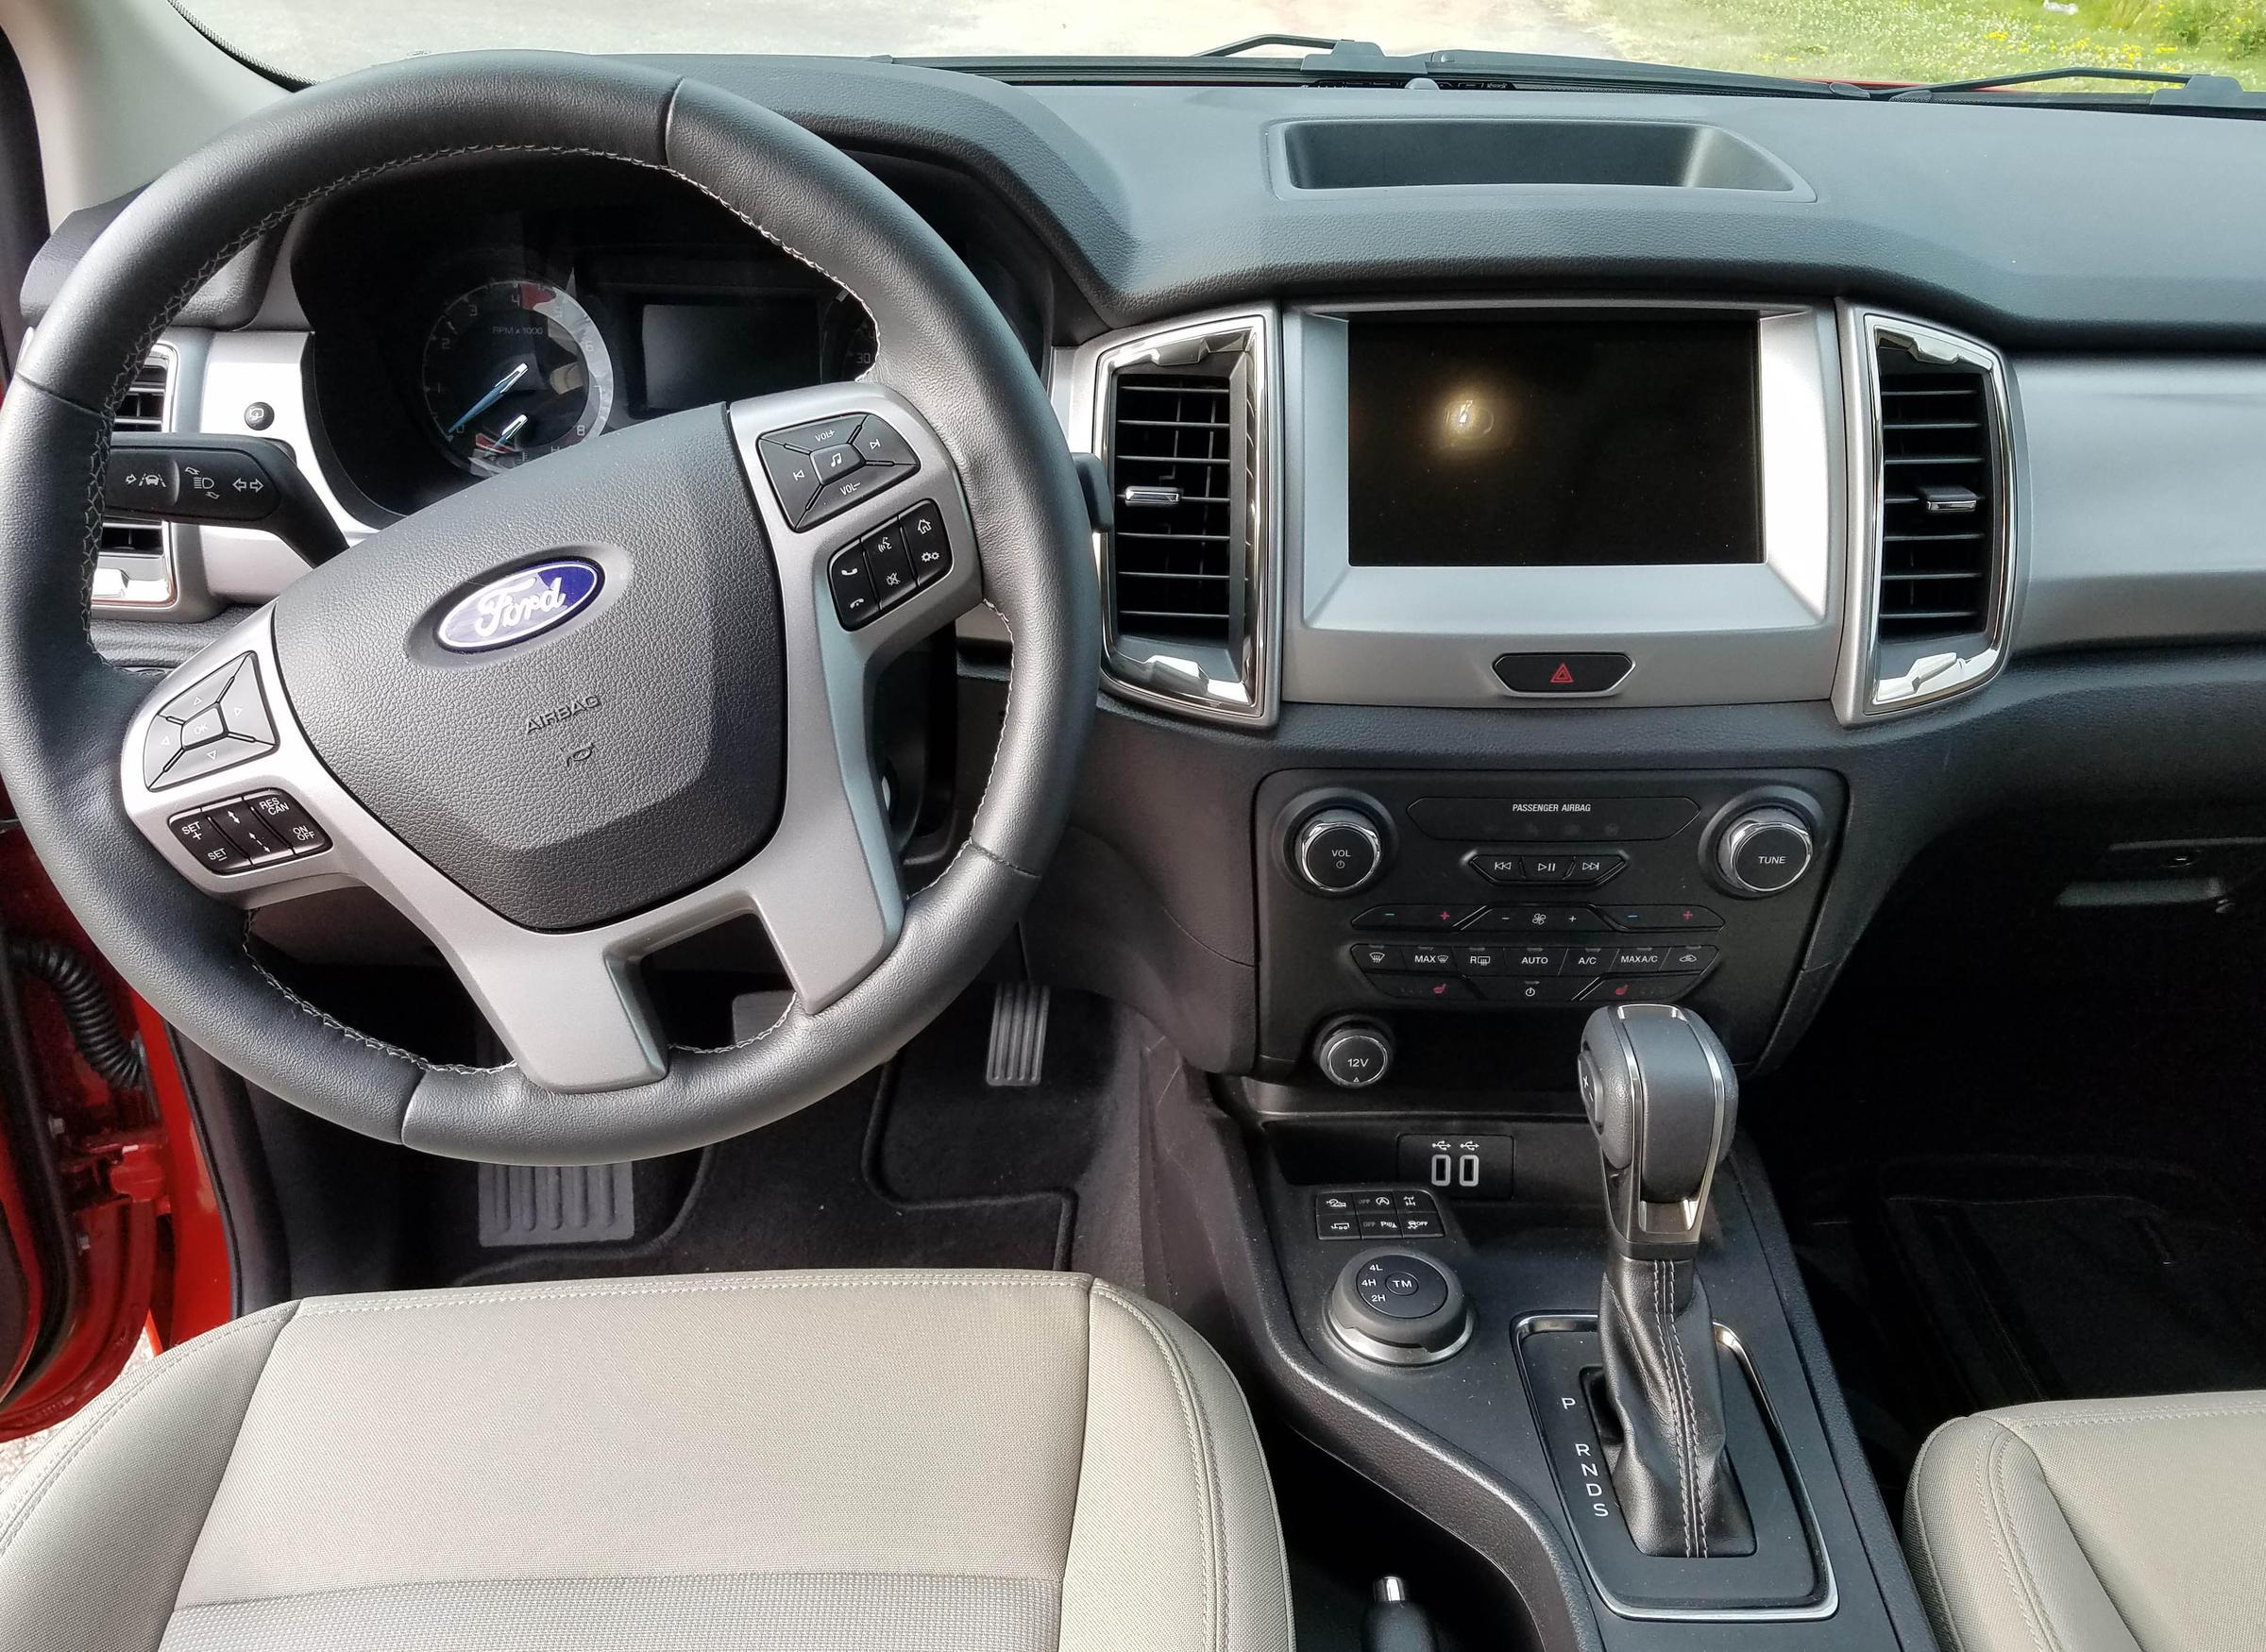 2019 Ford Ranger Xlt Supercrew 4x4 Review Wuwm